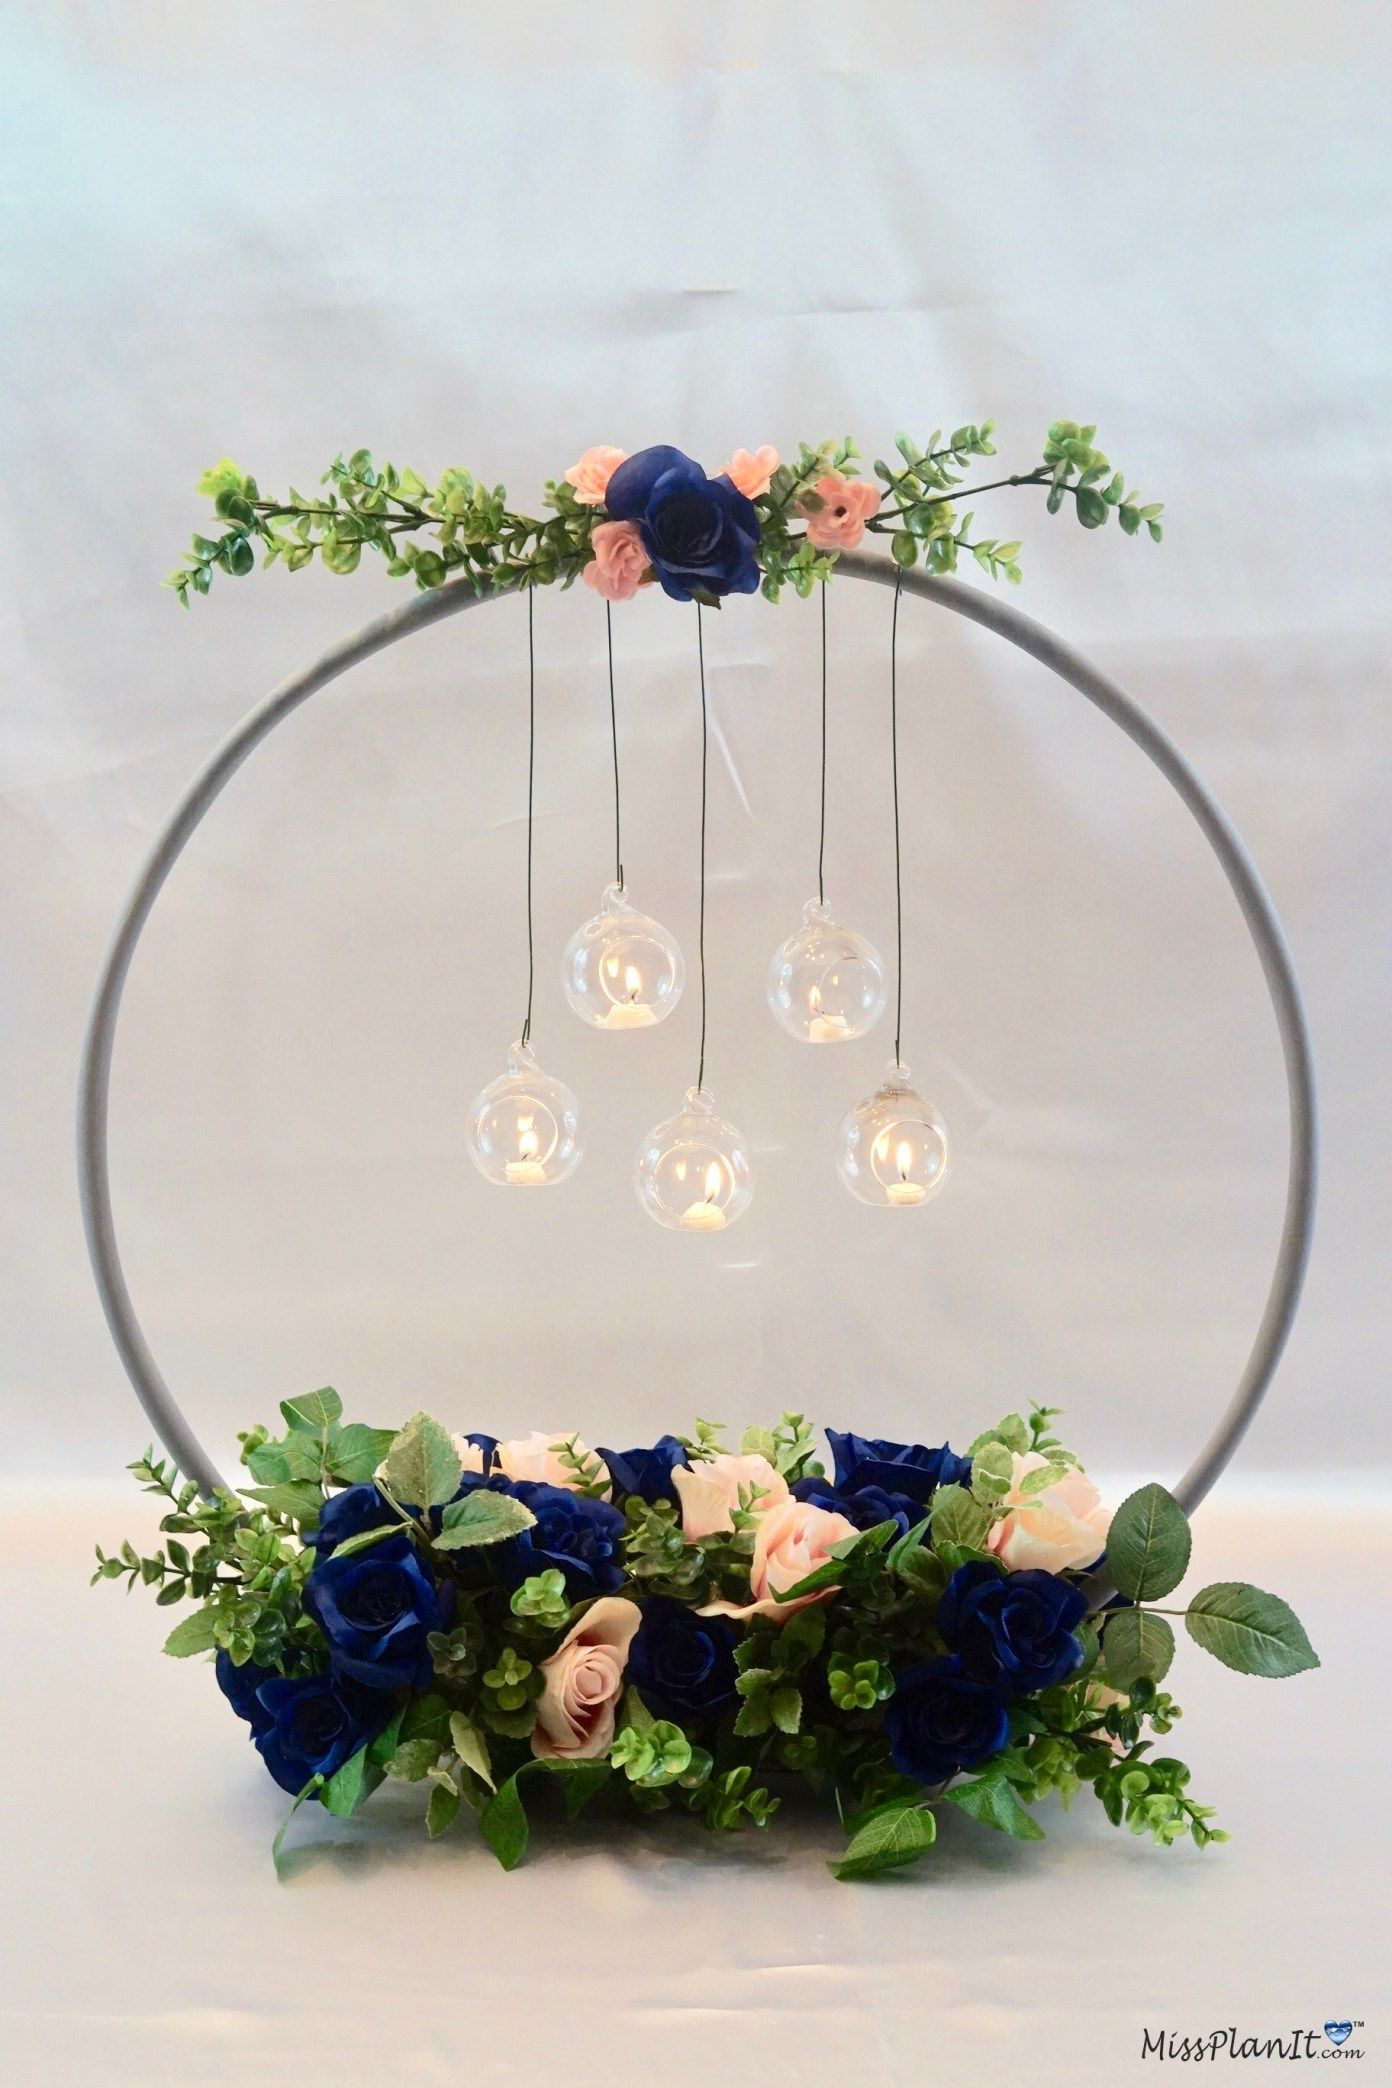 Wedding decoration ideas kerala   Hula Hoop Wedding Hack How to Make a Chandelier Wedding